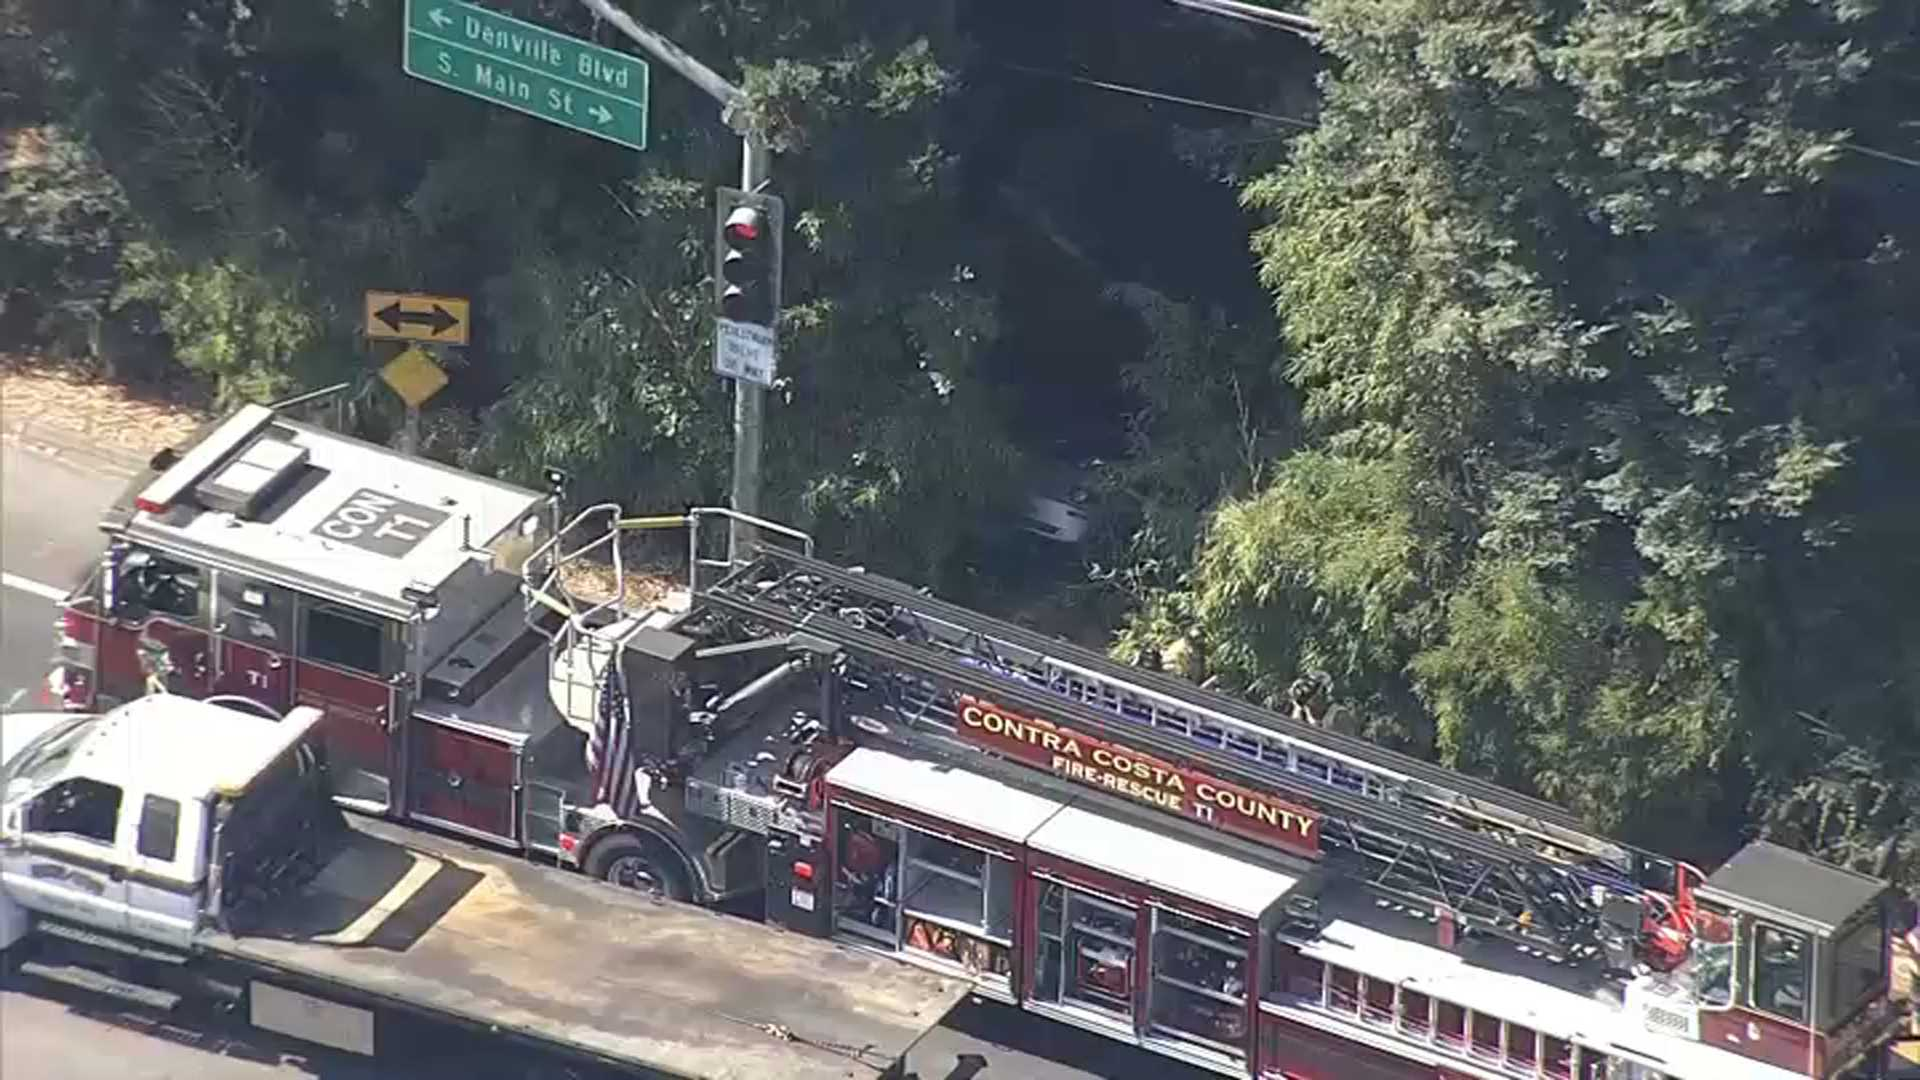 Man Dies Following Car Accident in Walnut Creek: Officials